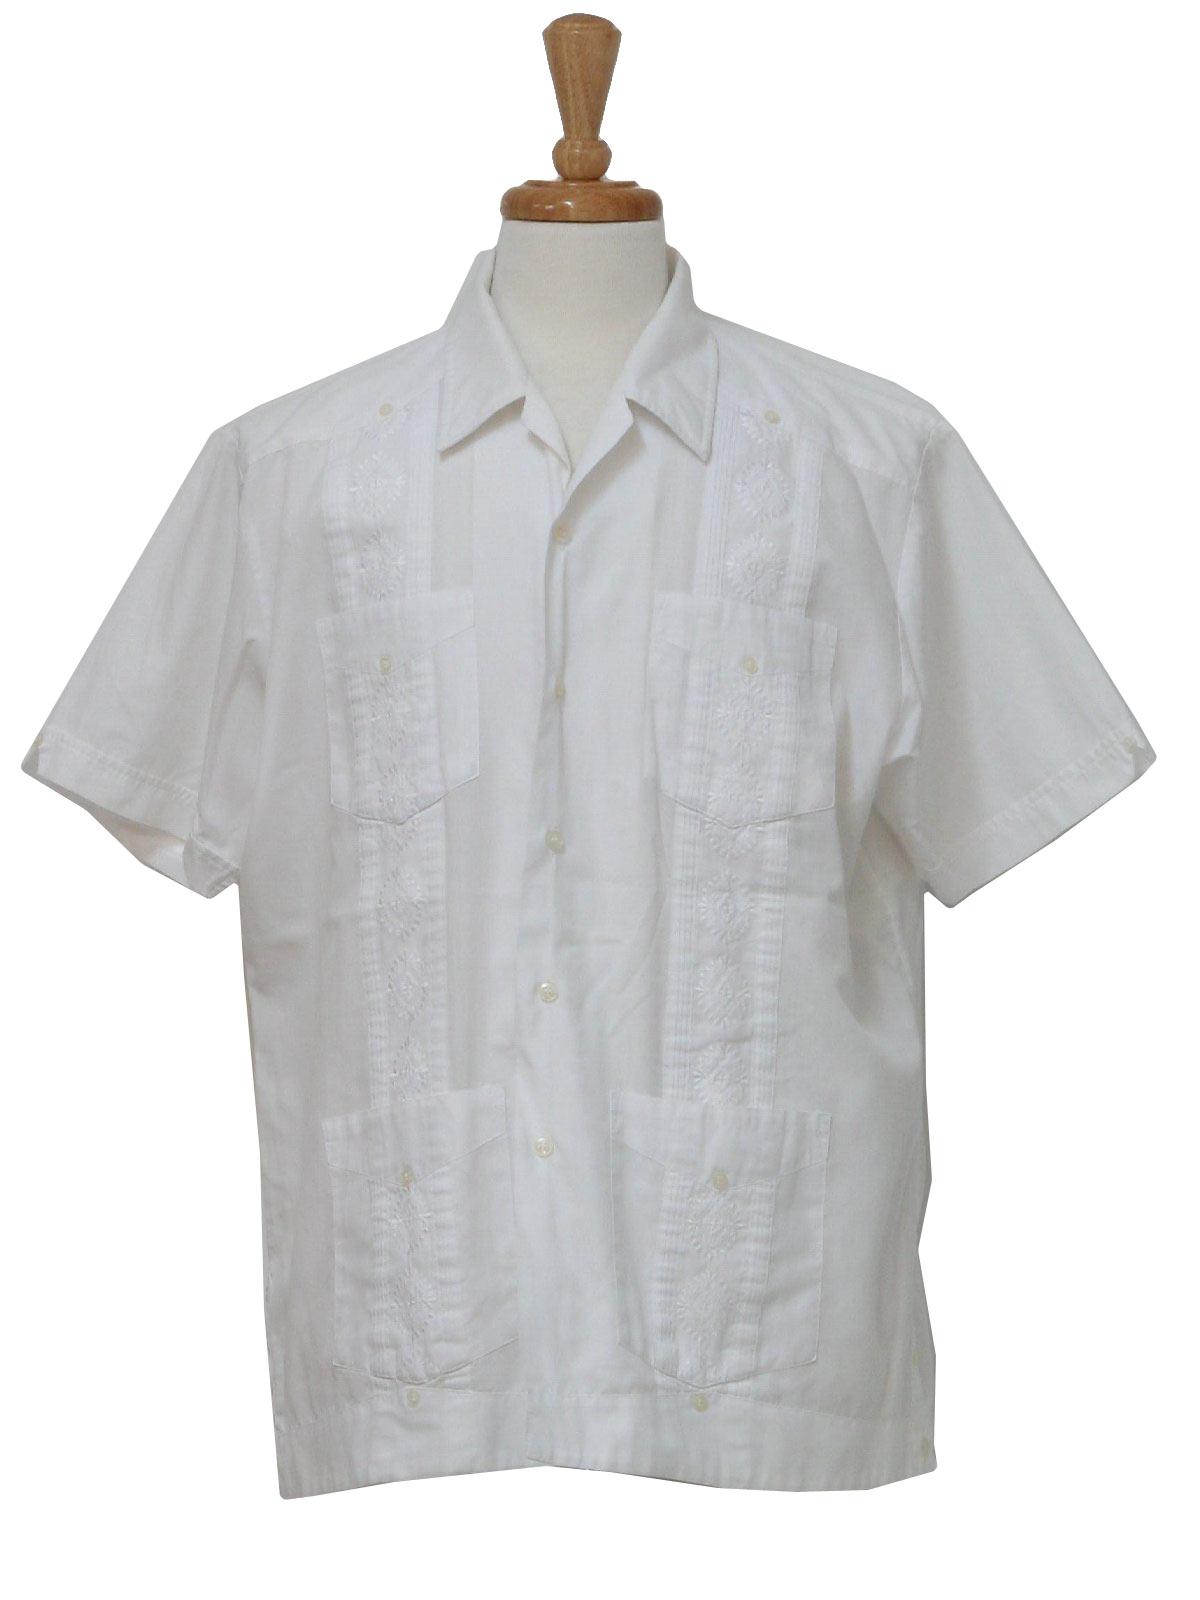 The Retro Fashion, Embroider on Shirts